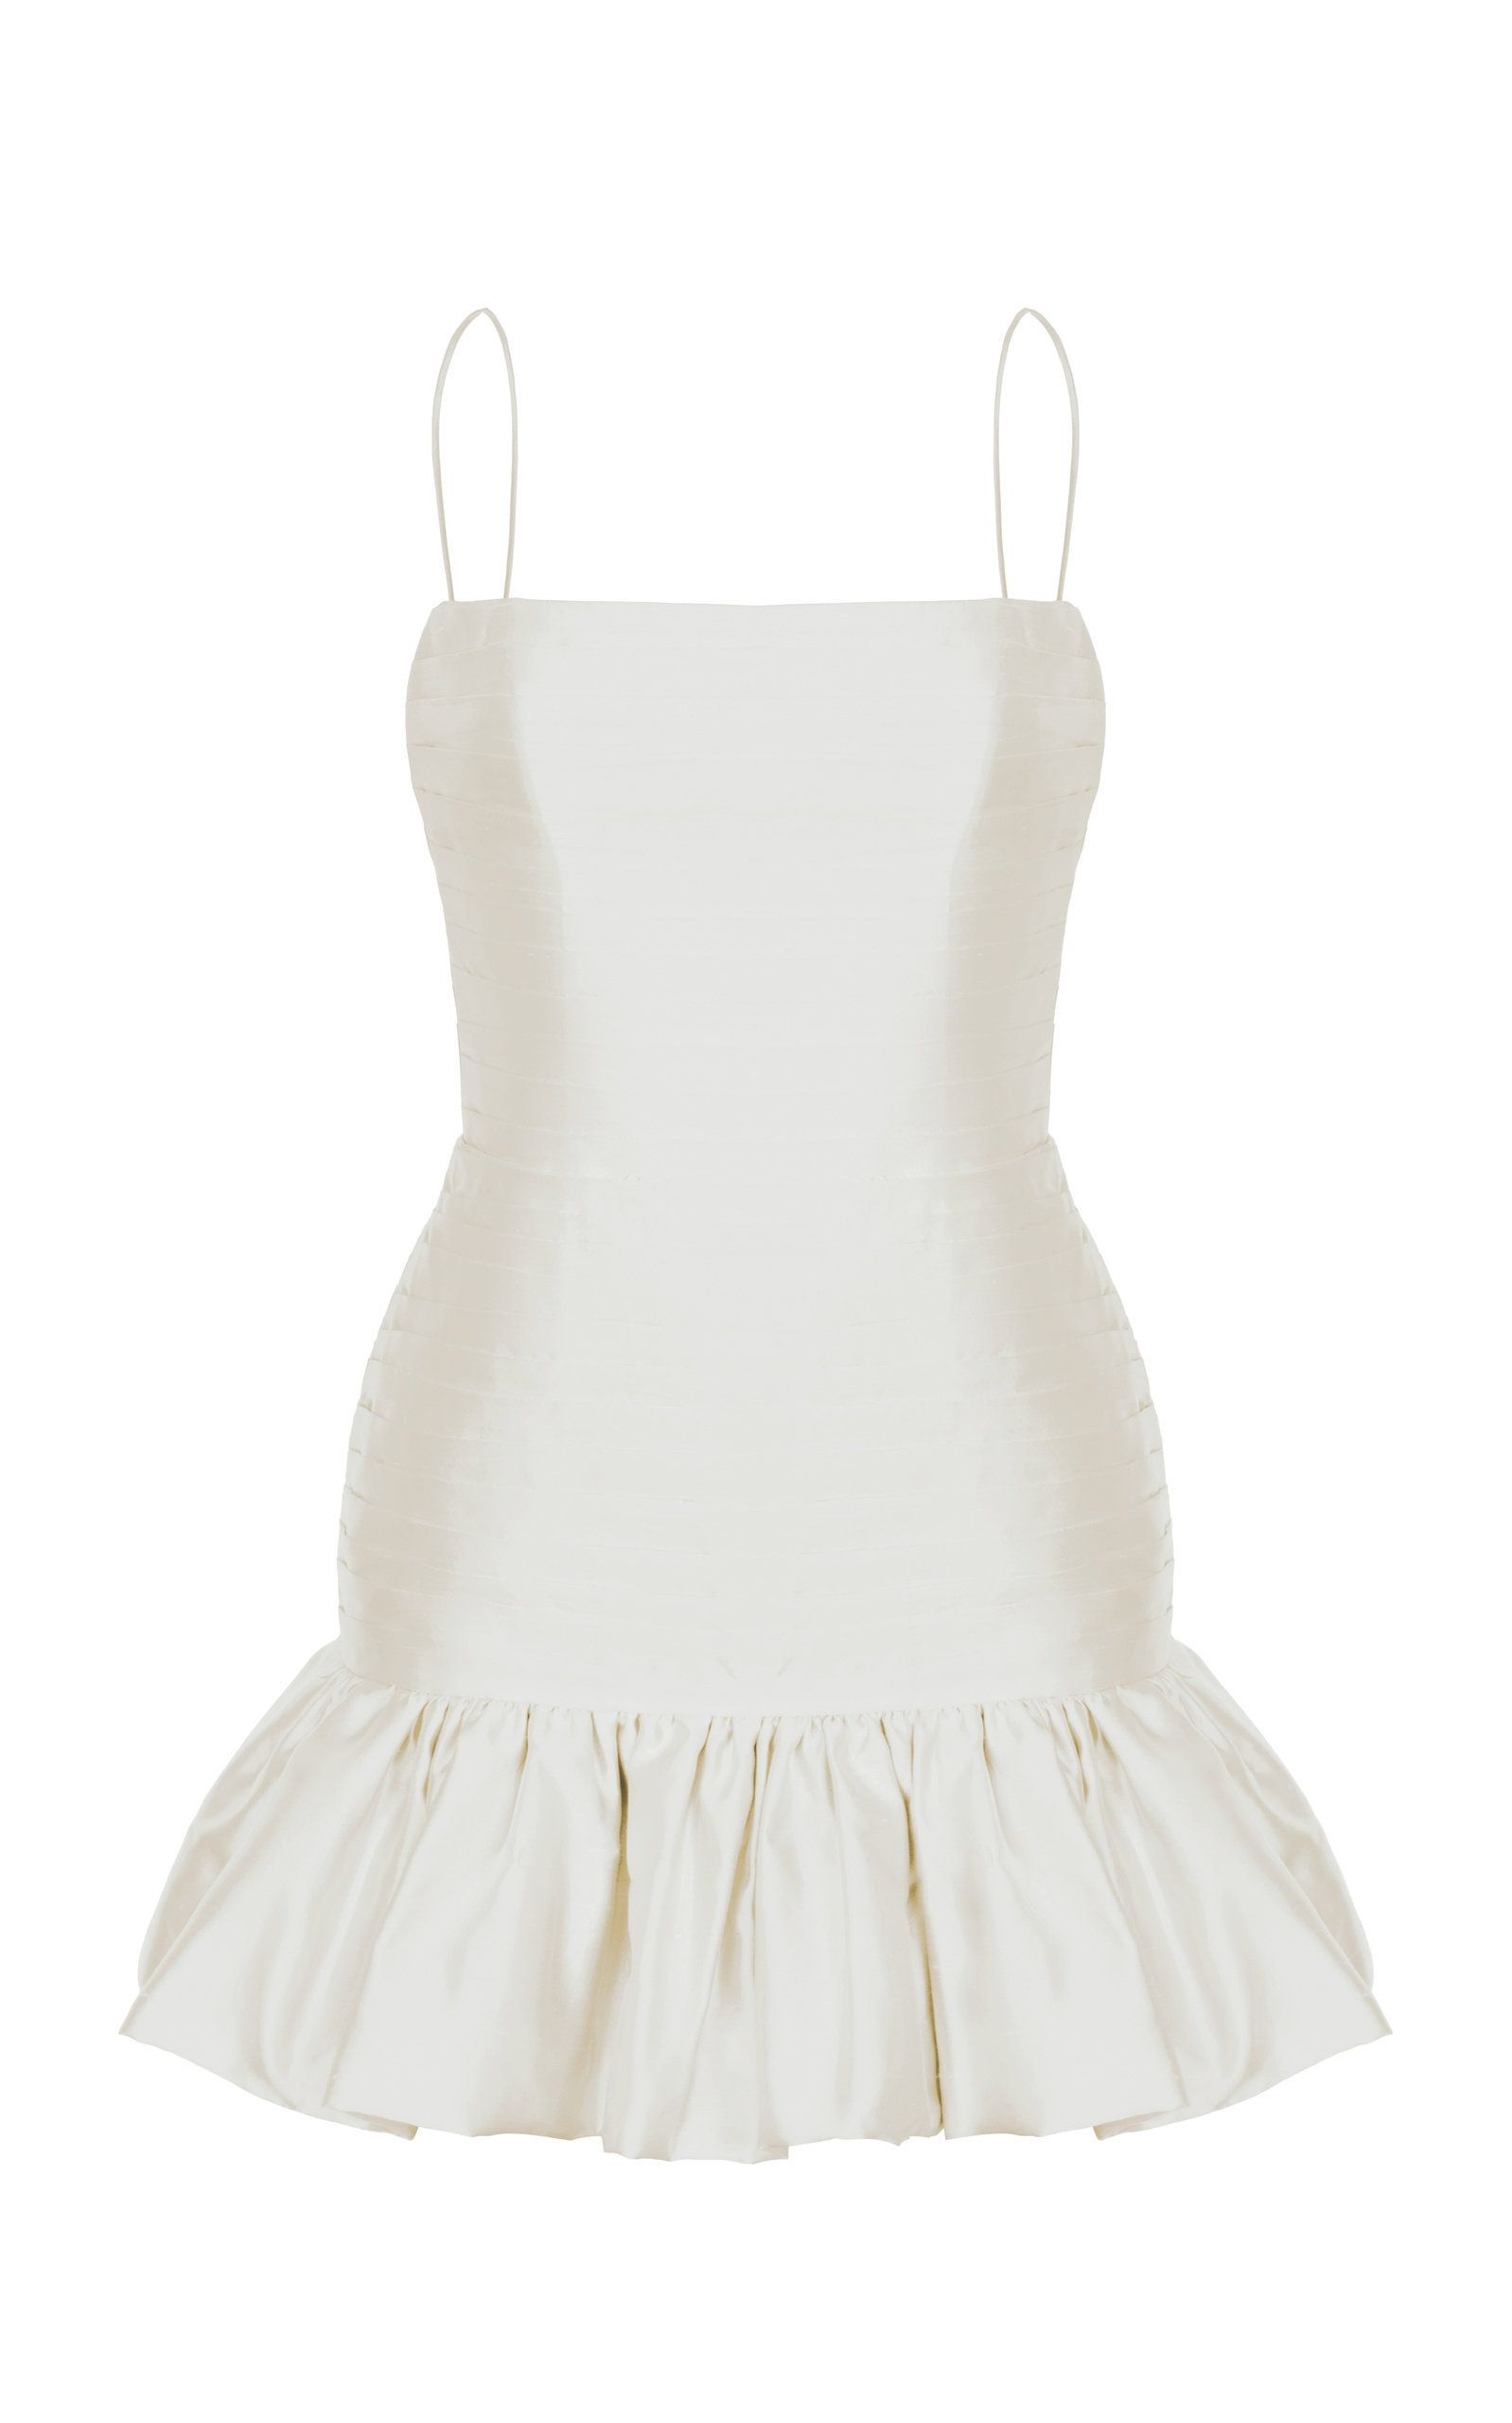 6da58afac1ec Low-Back Silk Mini Dress by RASARIO for Preorder on Moda Operandi Flirty  white mini ruffle